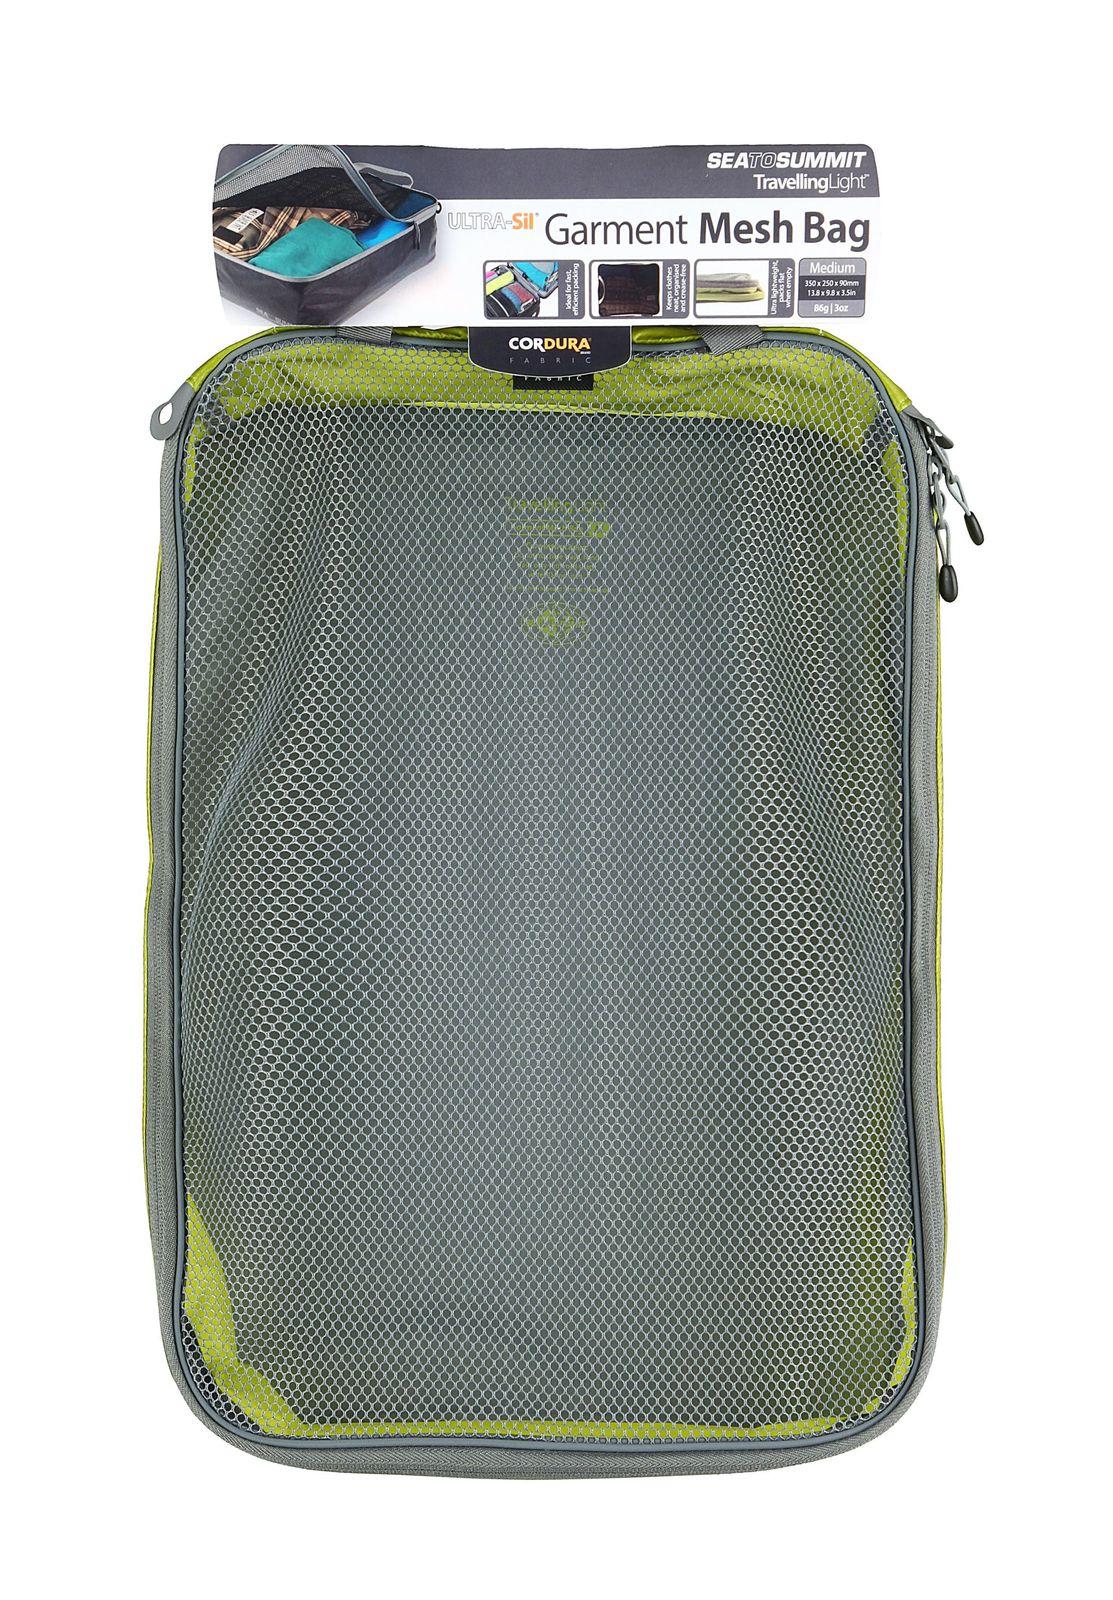 Sea To Summit TravellingLight Garment Mesh Bag Medium Lime / Grey